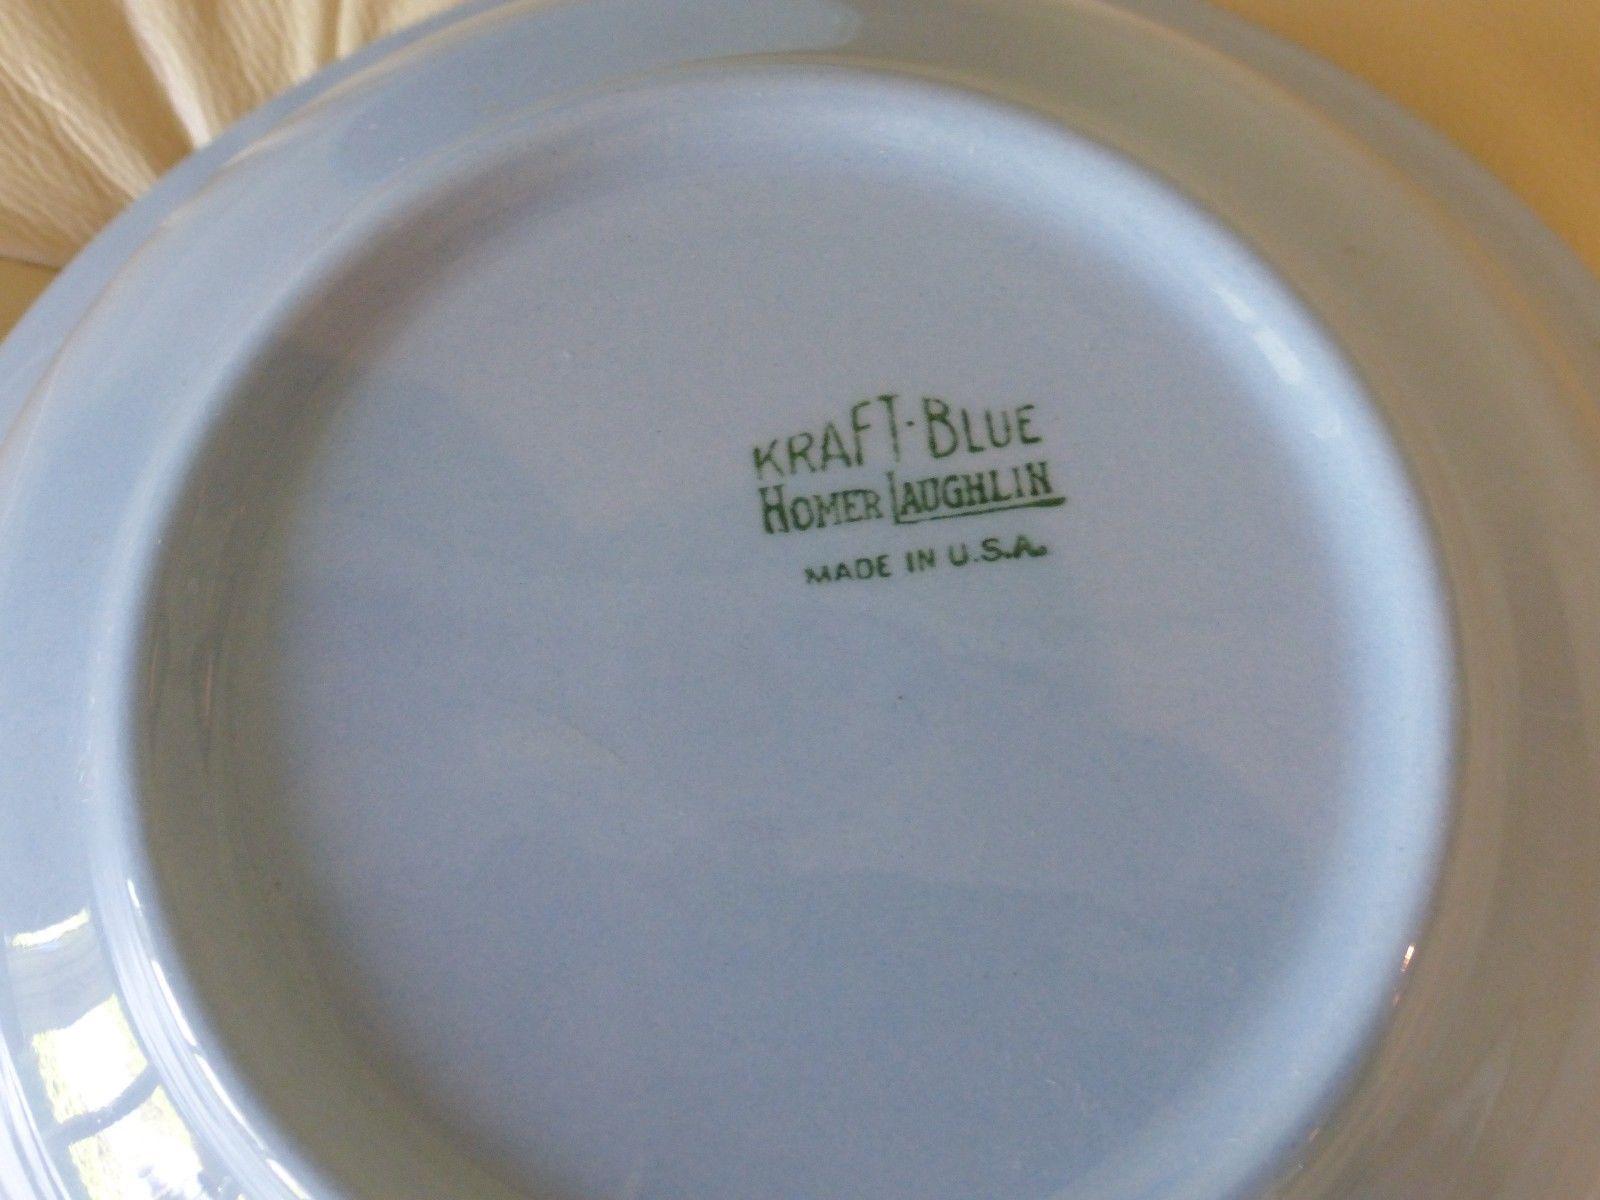 "Kraft Blue by Homer Laughlin Vegetable Bowl 8 3/4"" image 2"